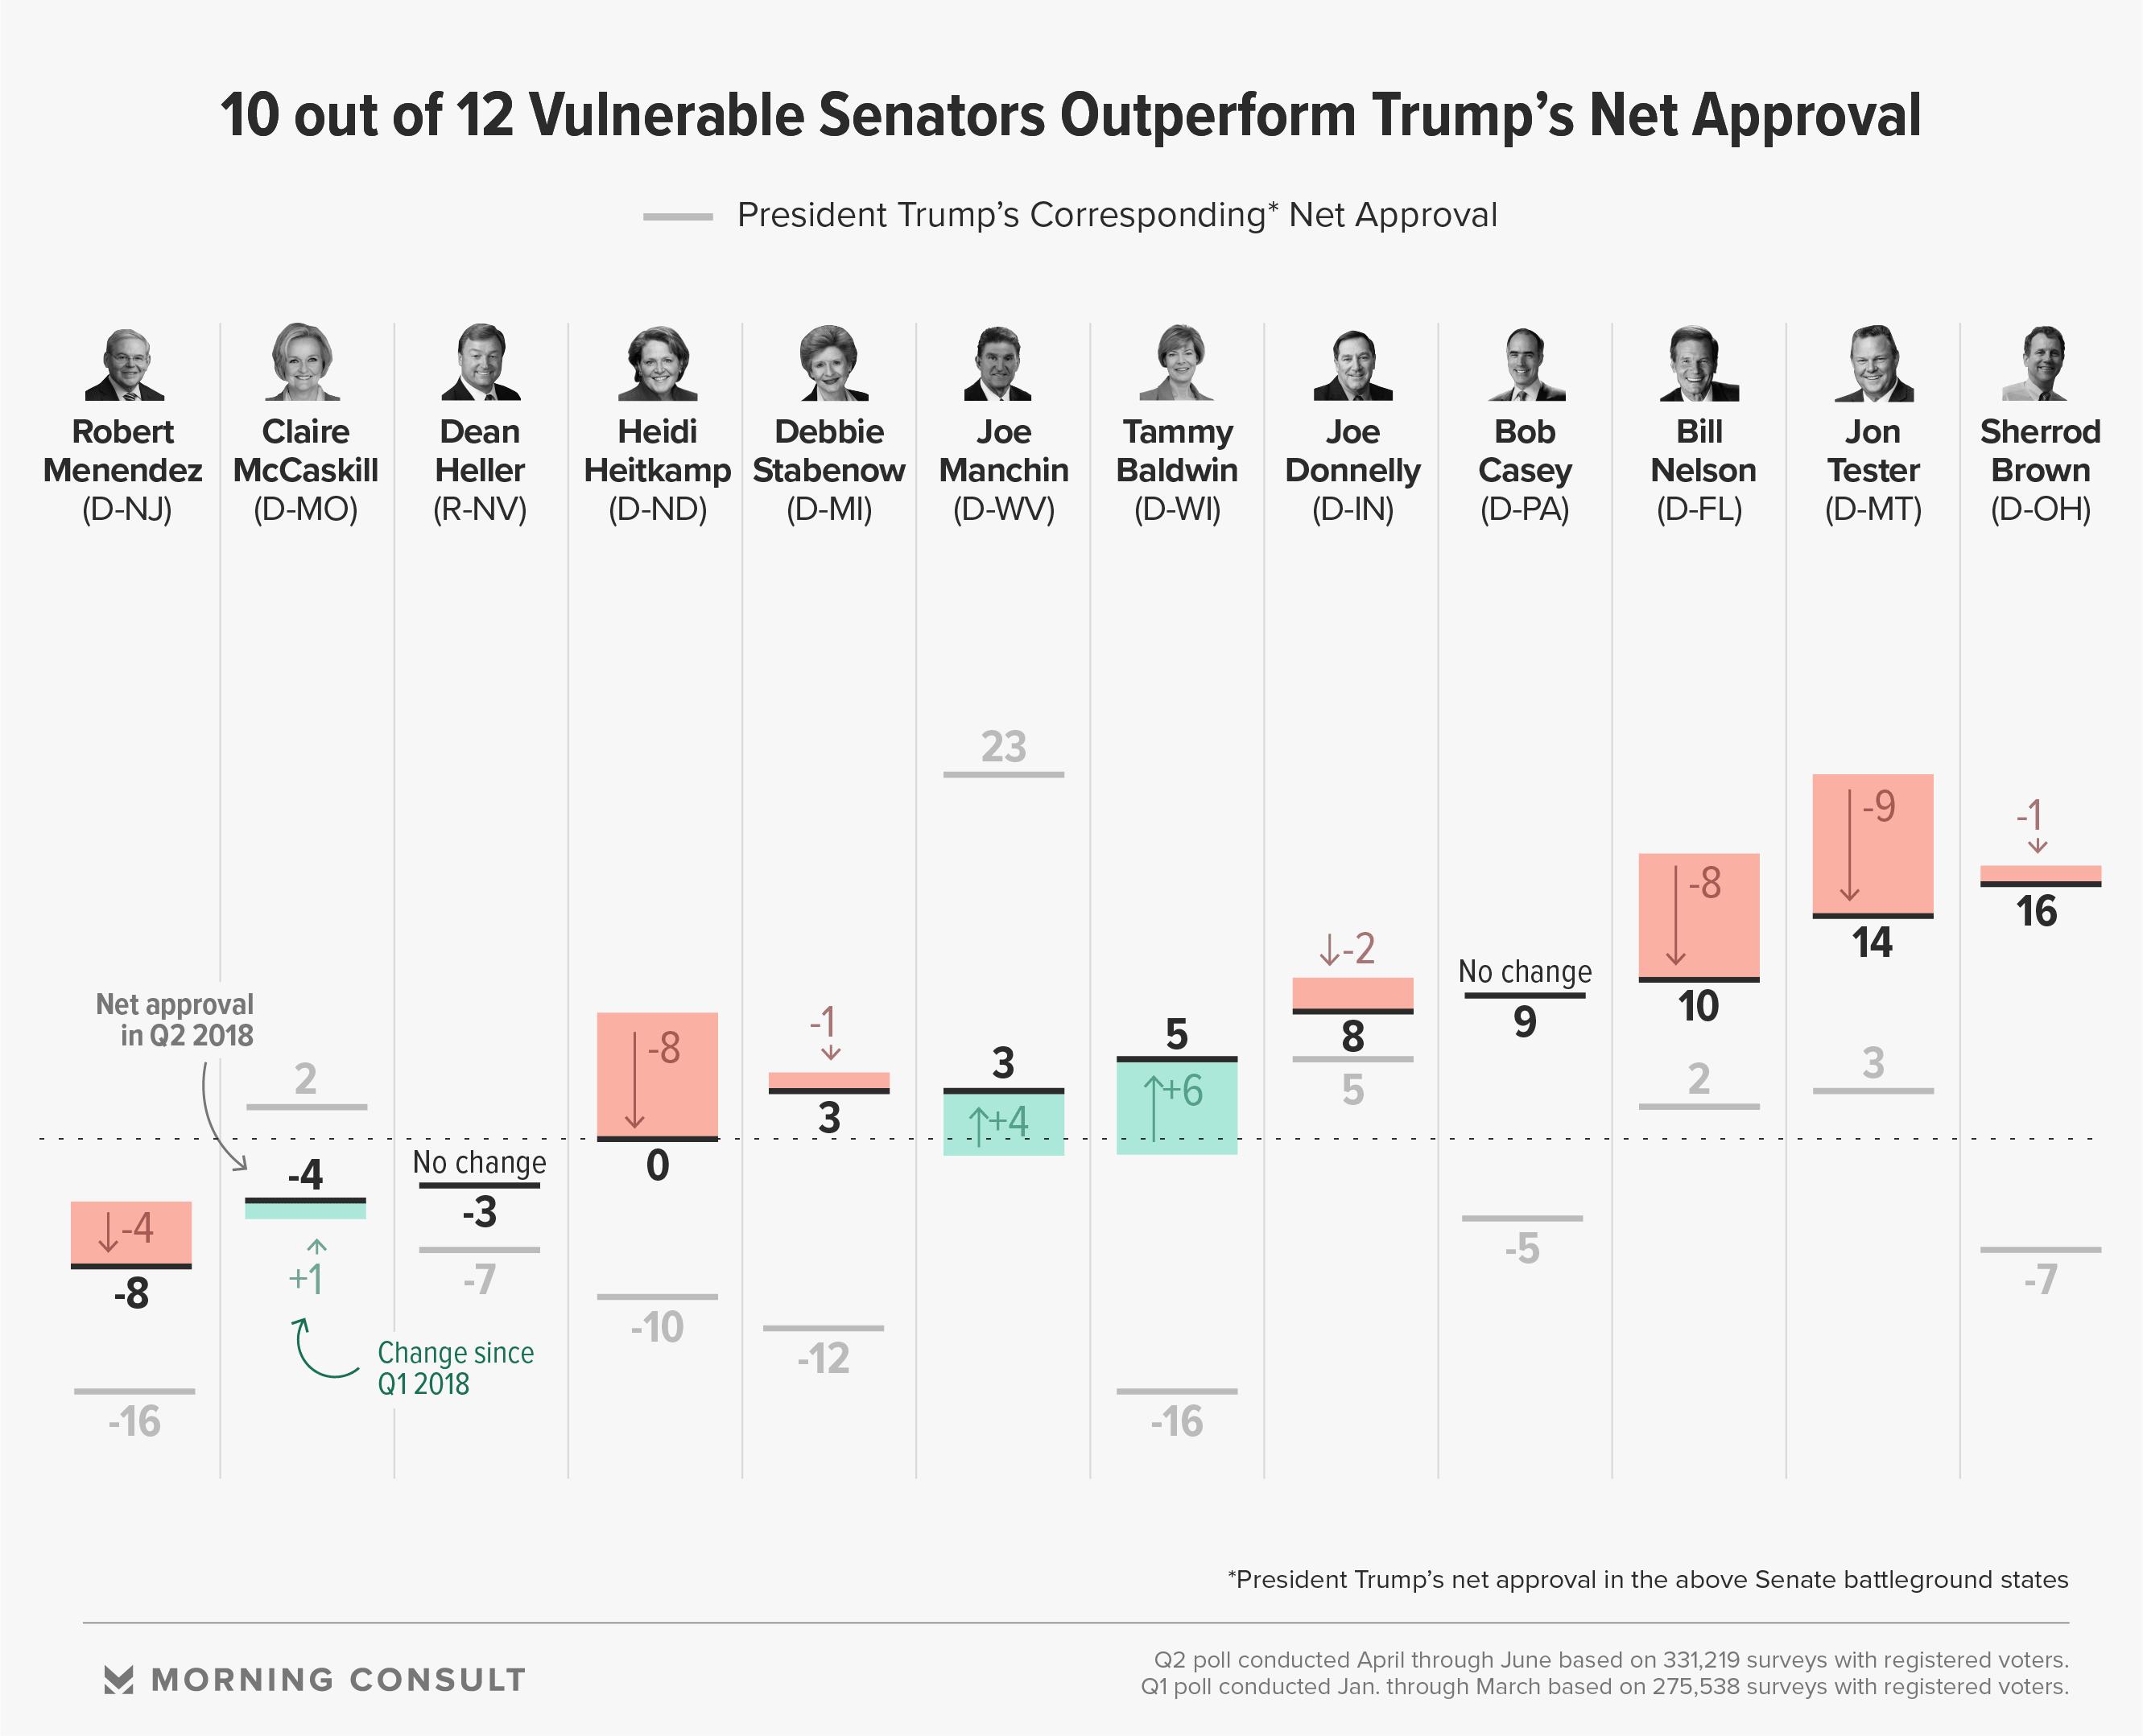 America's Most and Least Popular Senators — July 2018